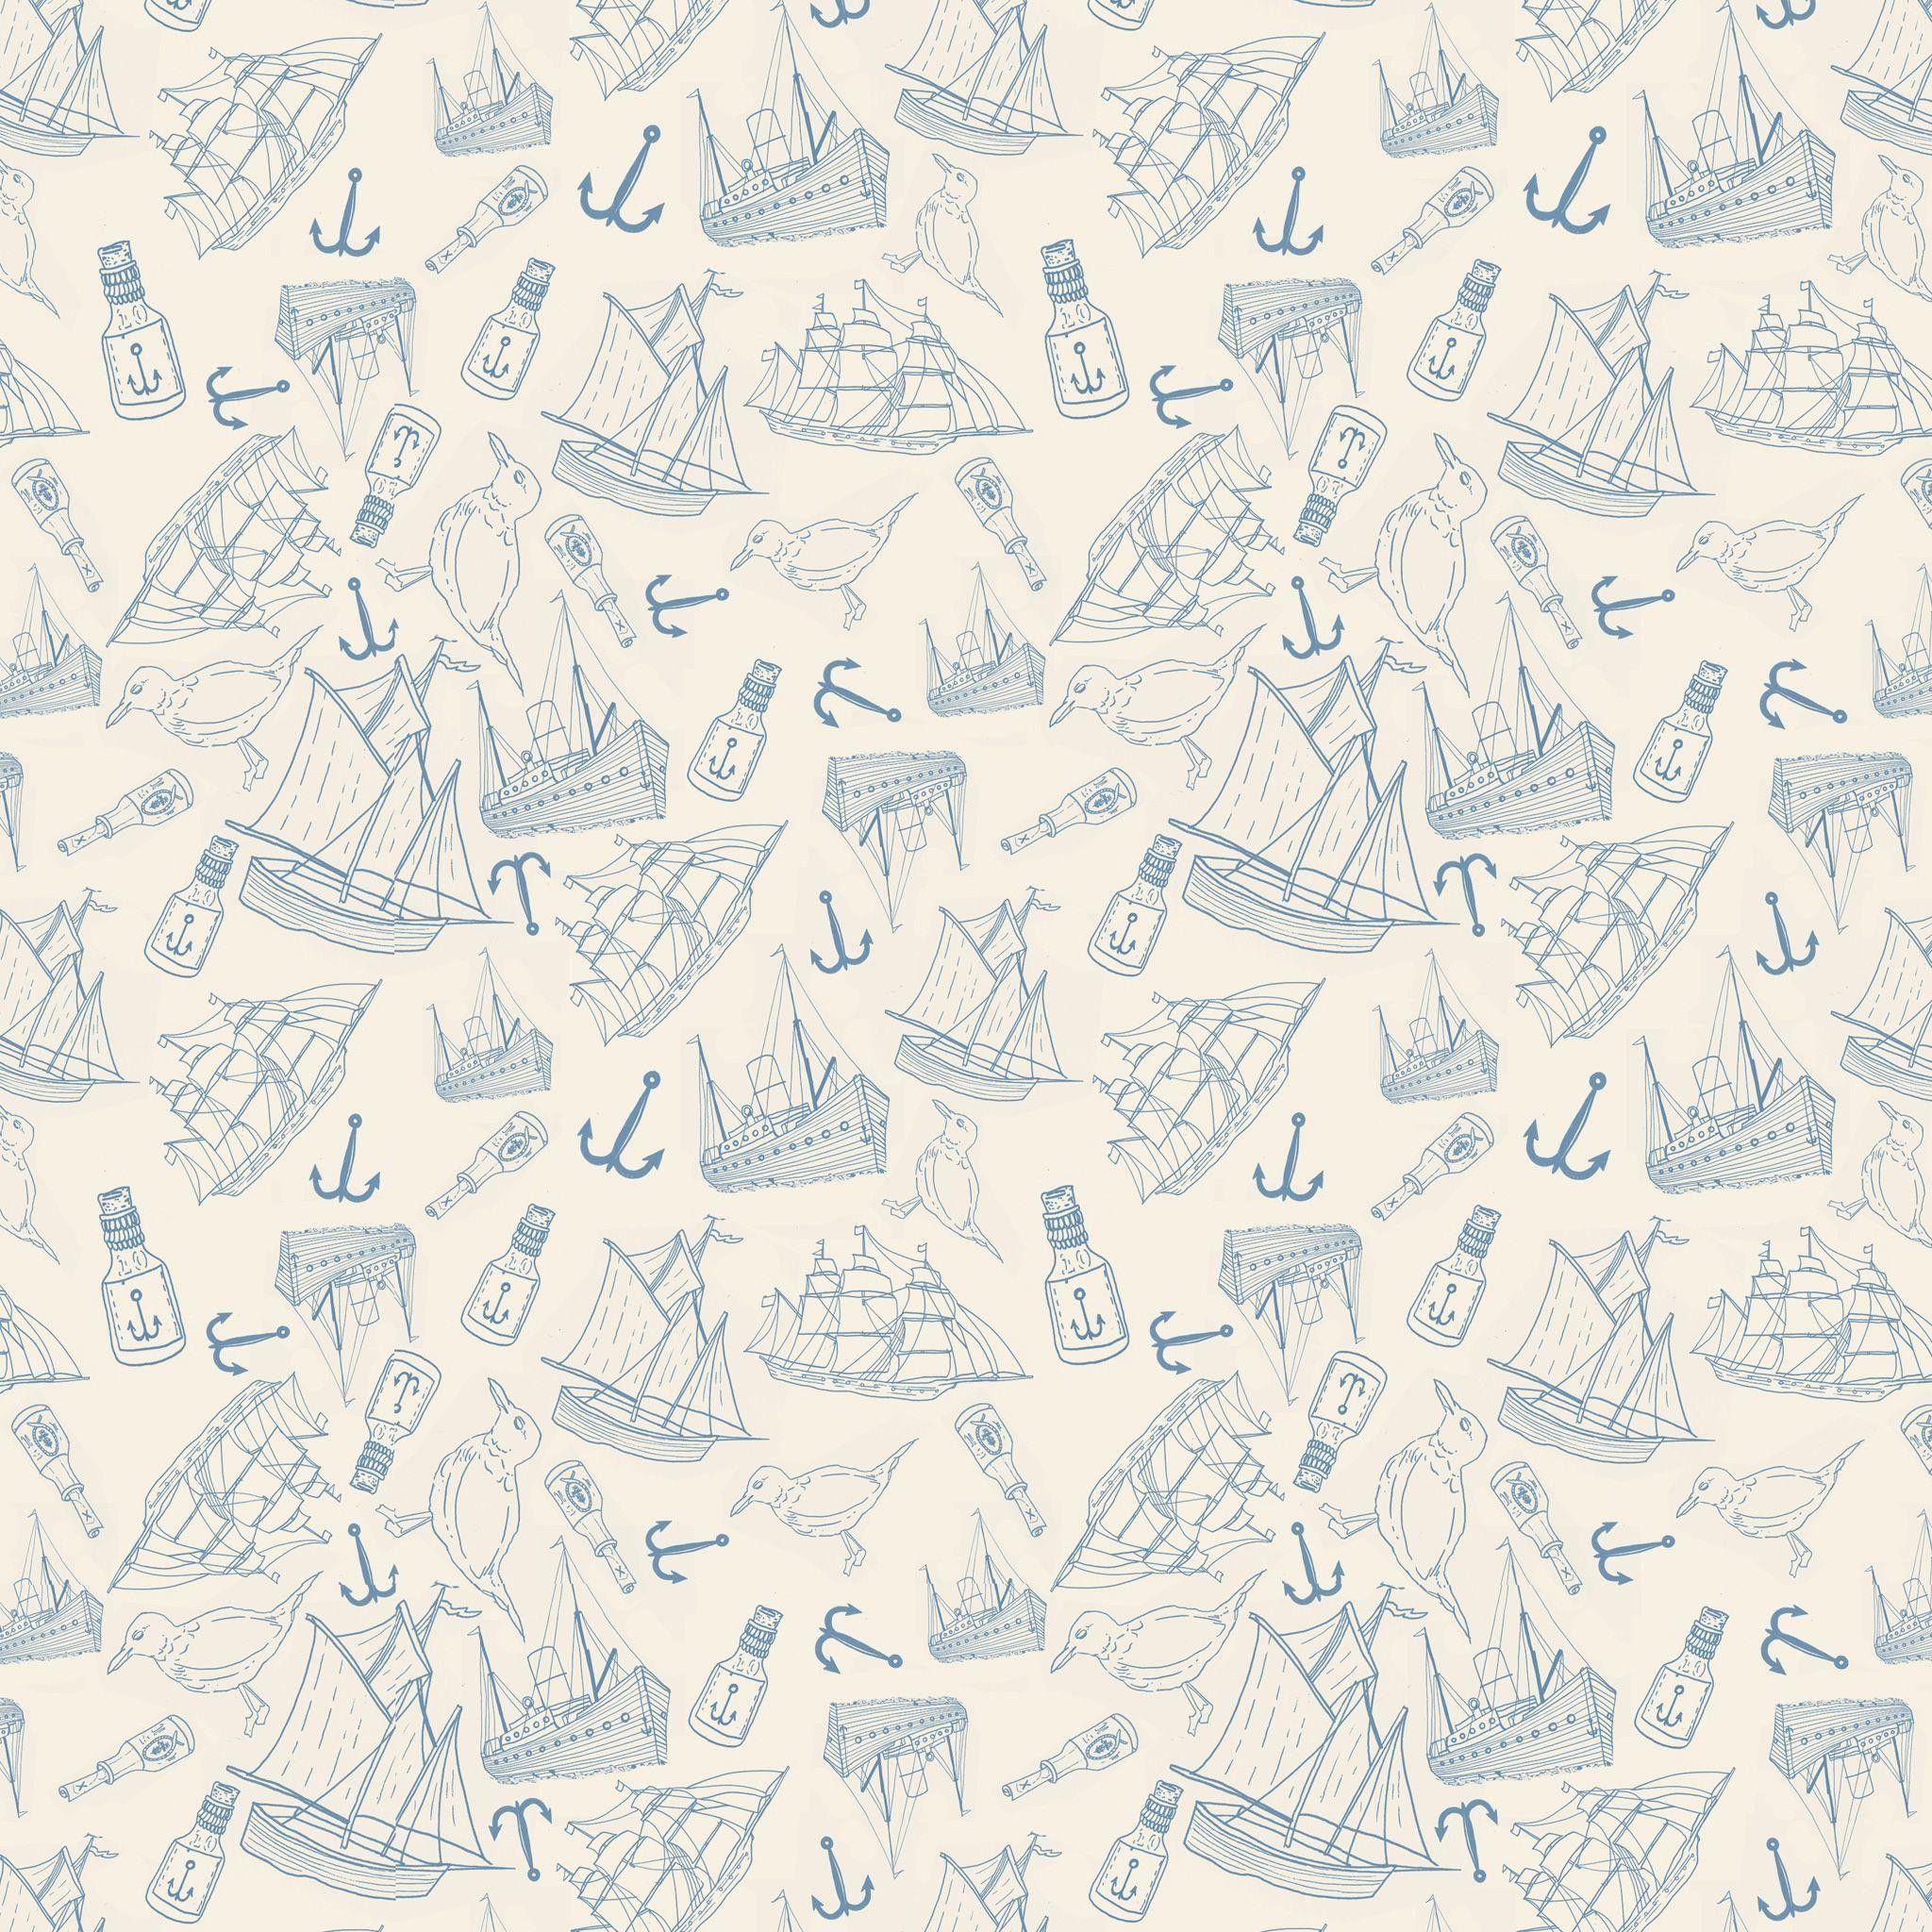 Nautical wallpaper – One More Fun Wall Art